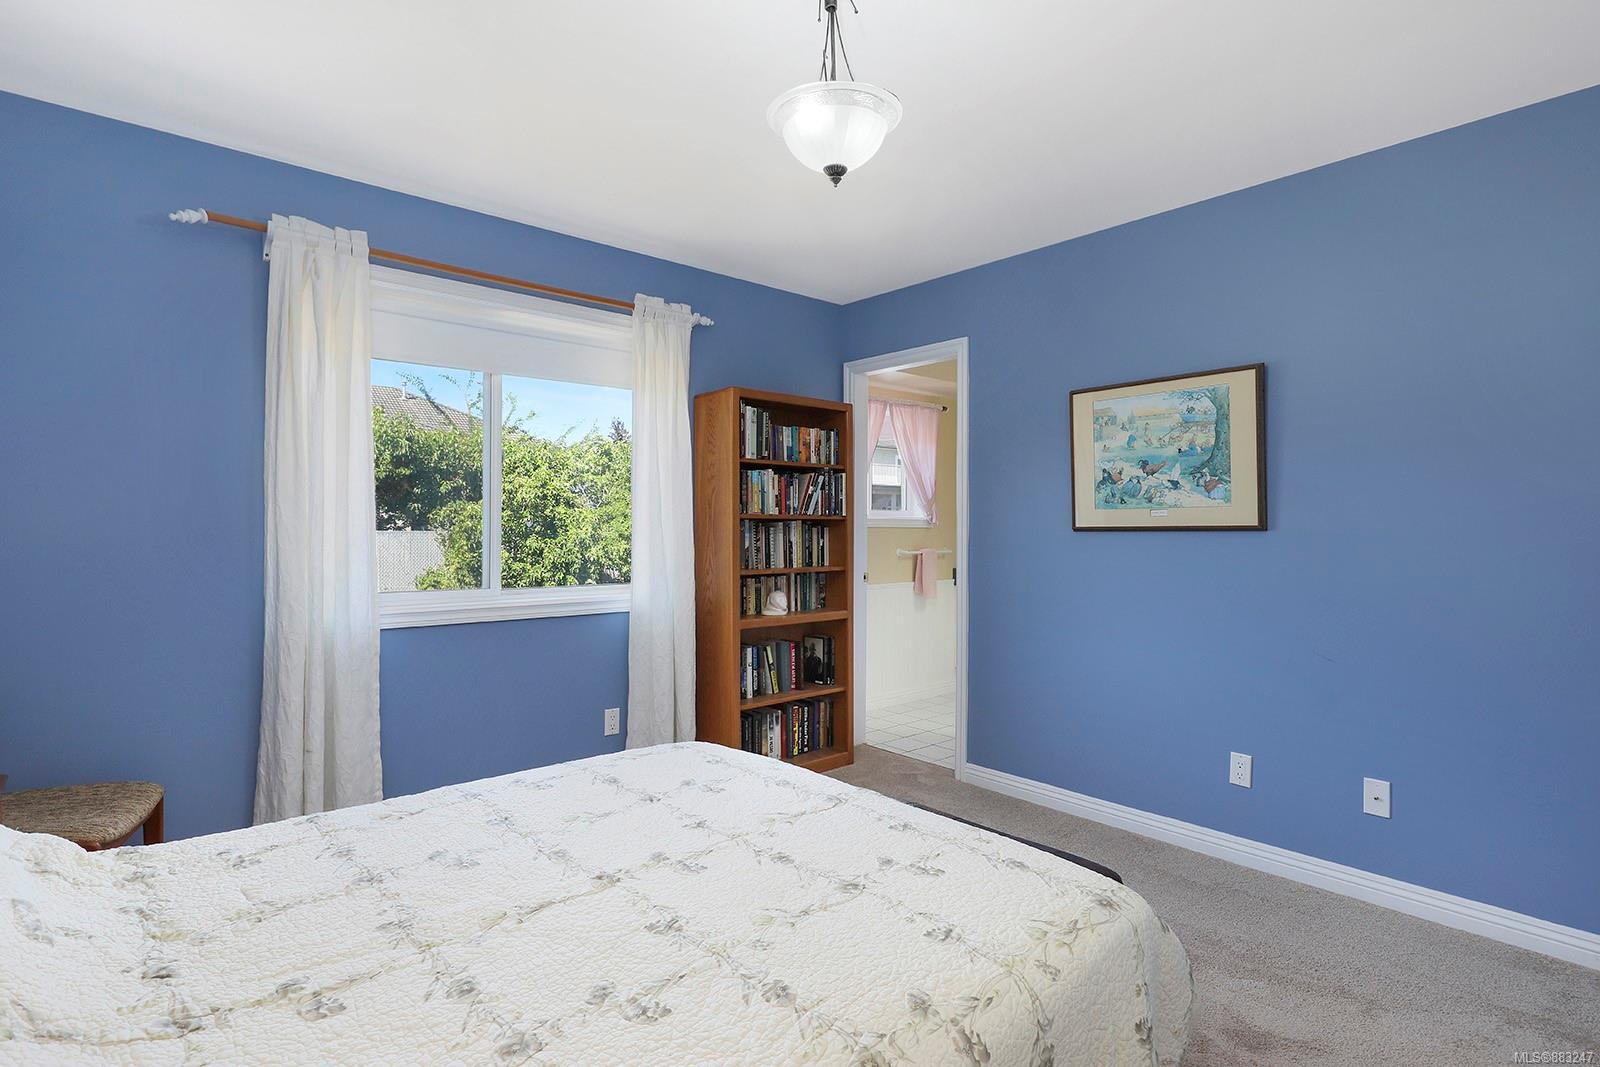 Photo 29 at 1651 Swan Crescent, Courtenay City, Comox Valley